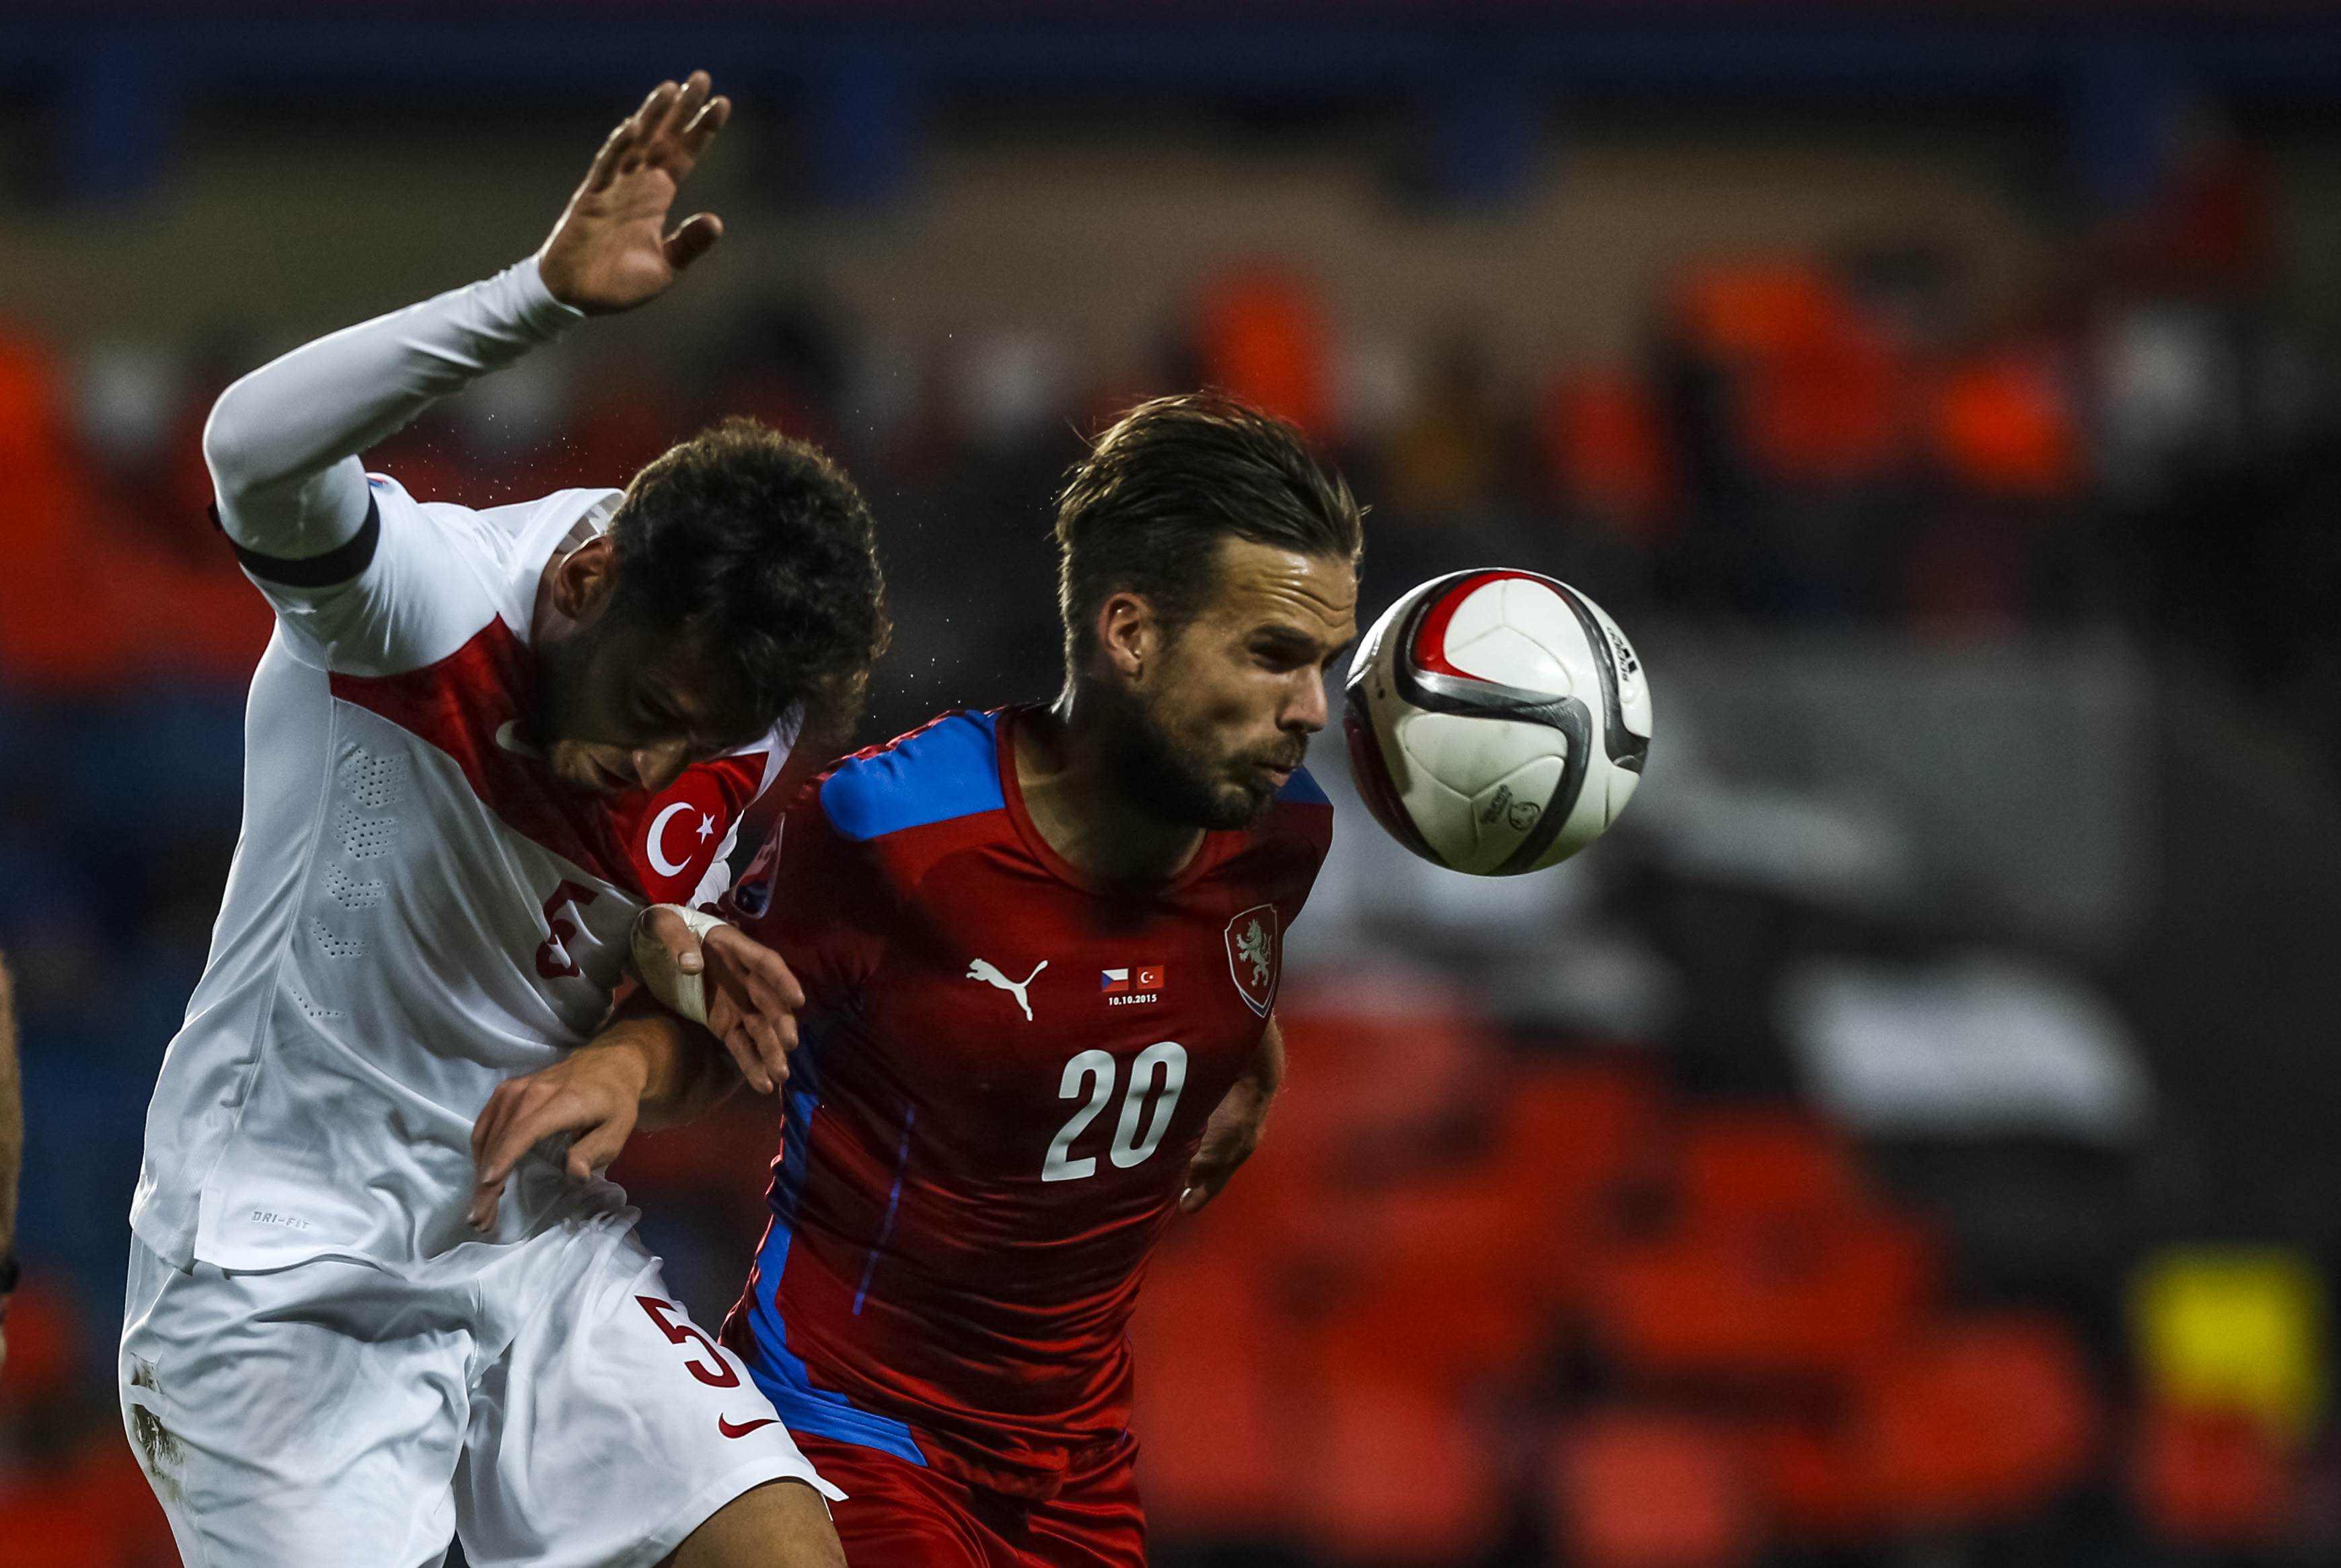 Hakan Calhanoglu - Filip Novak - Czech Republic v Turkey - EURO 2016